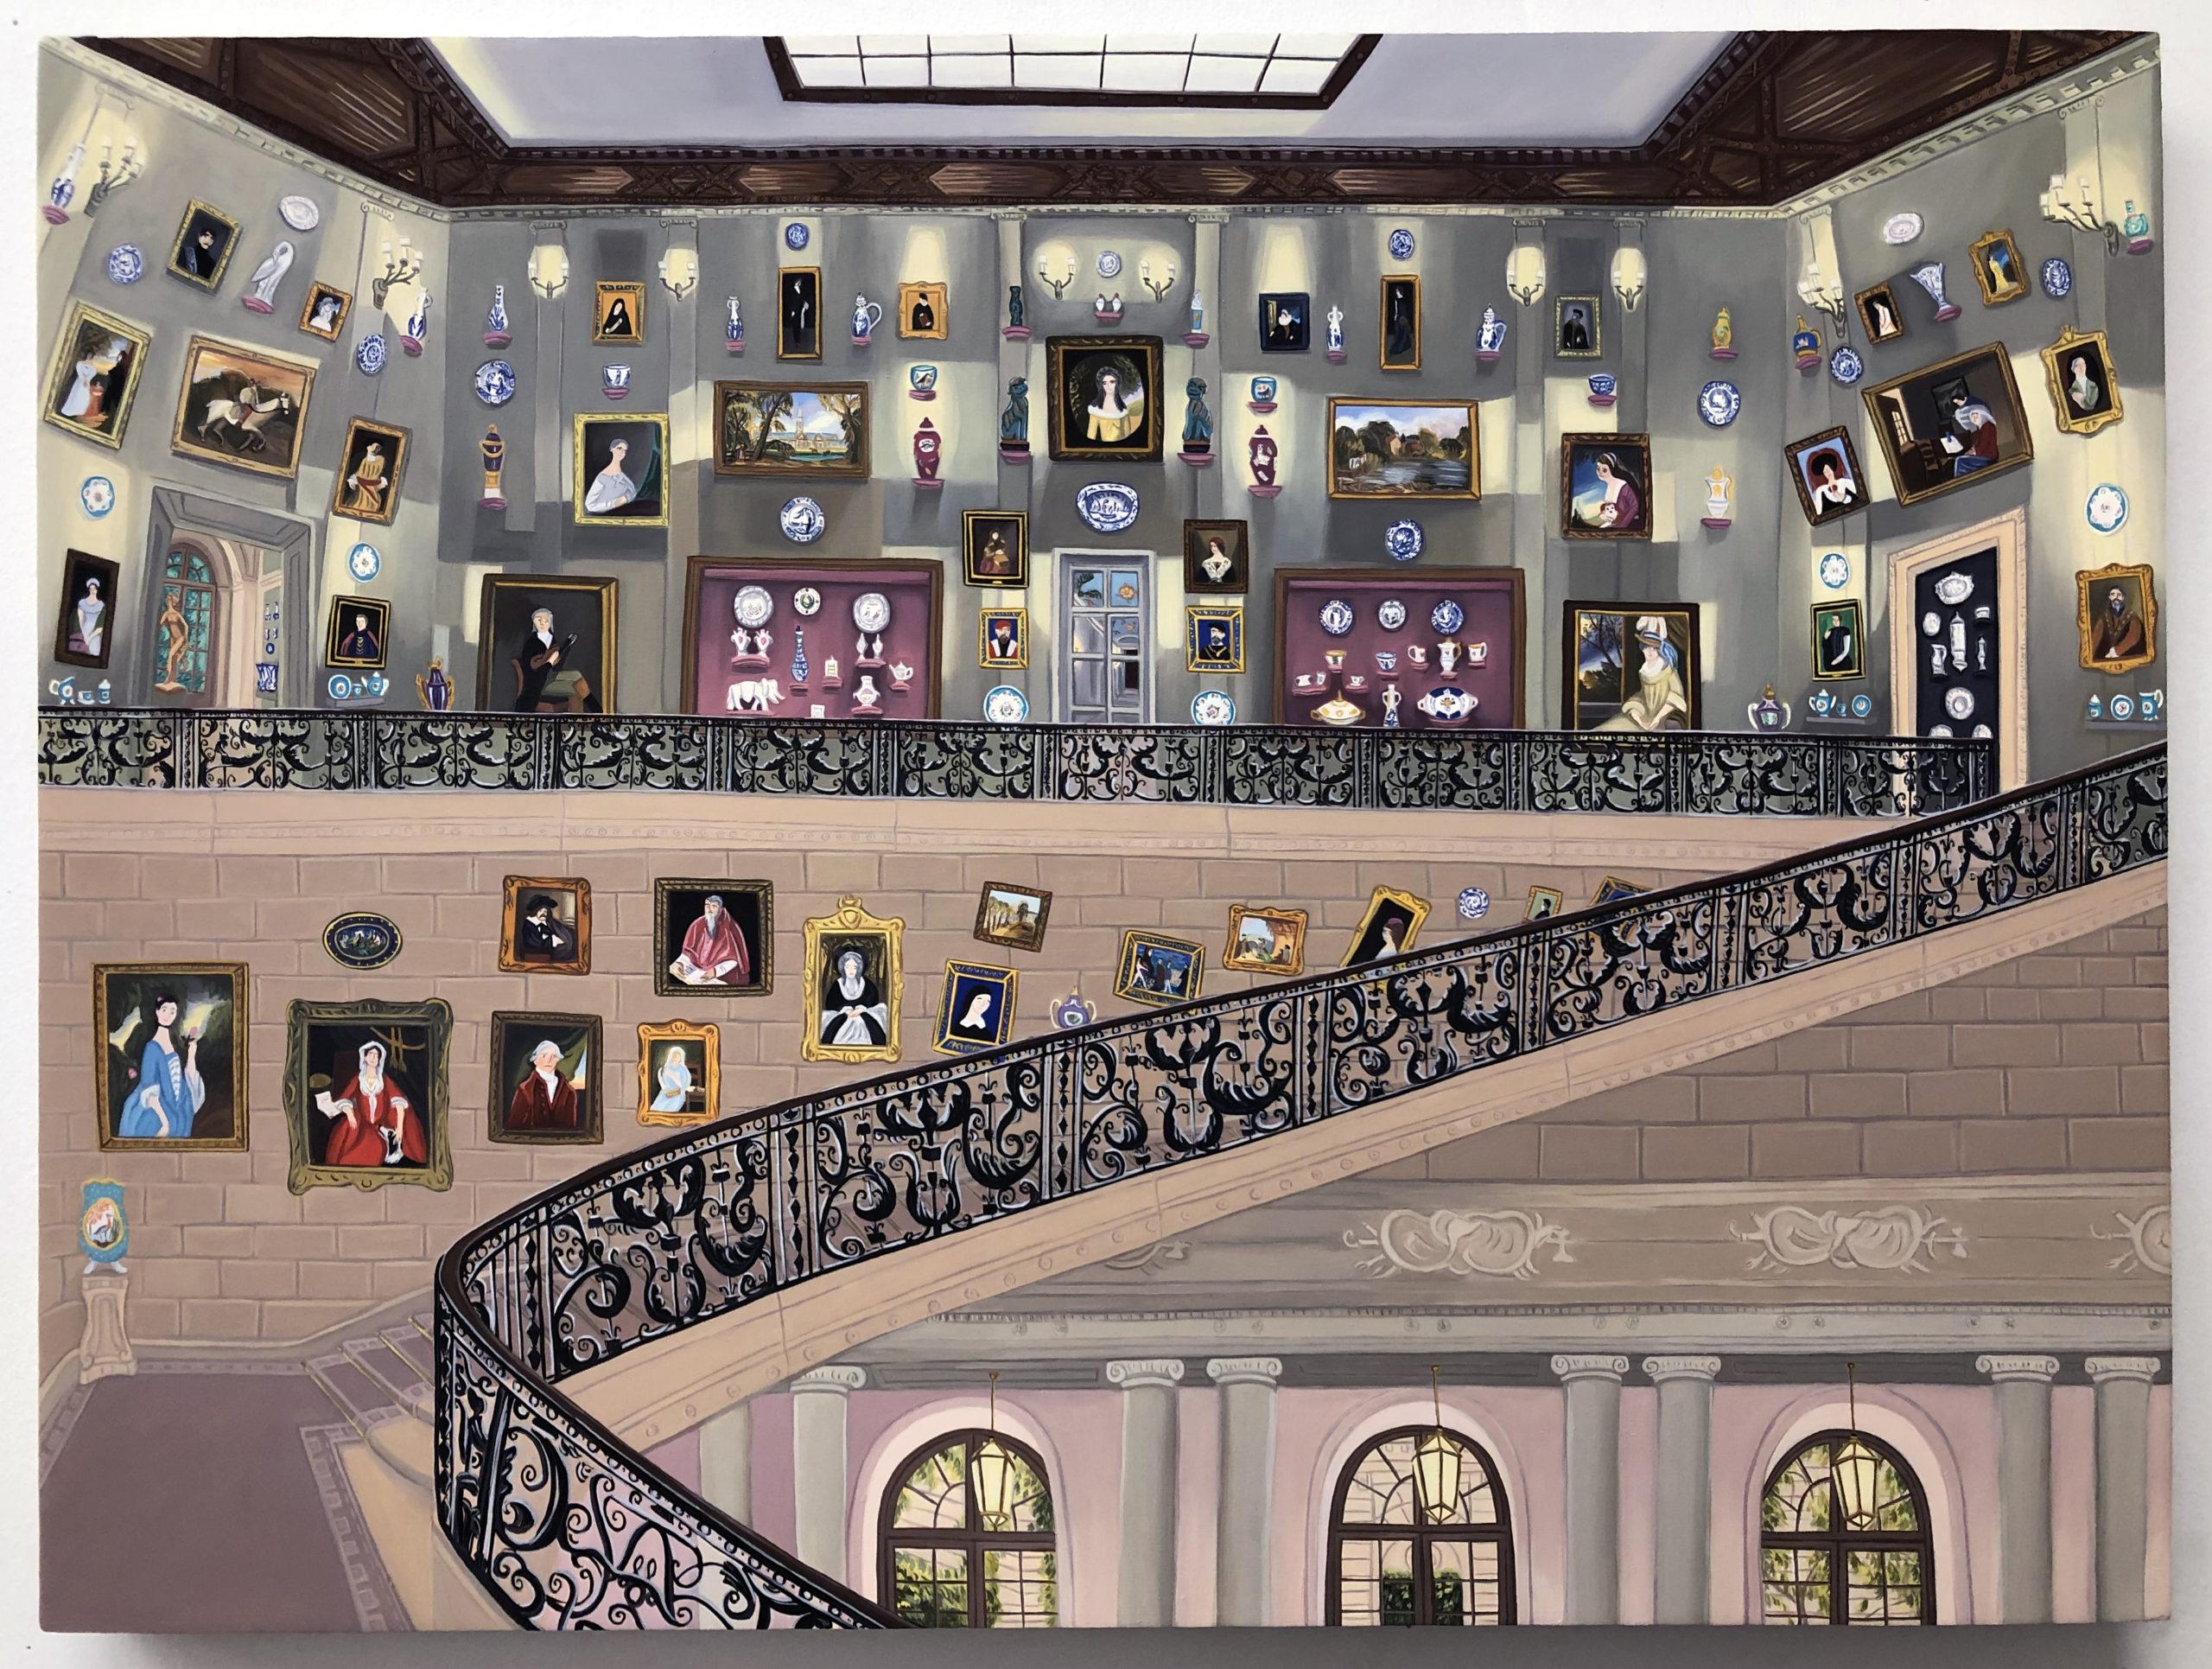 Gretchen Scherer Imagining the Frick, Second Floor, 2020